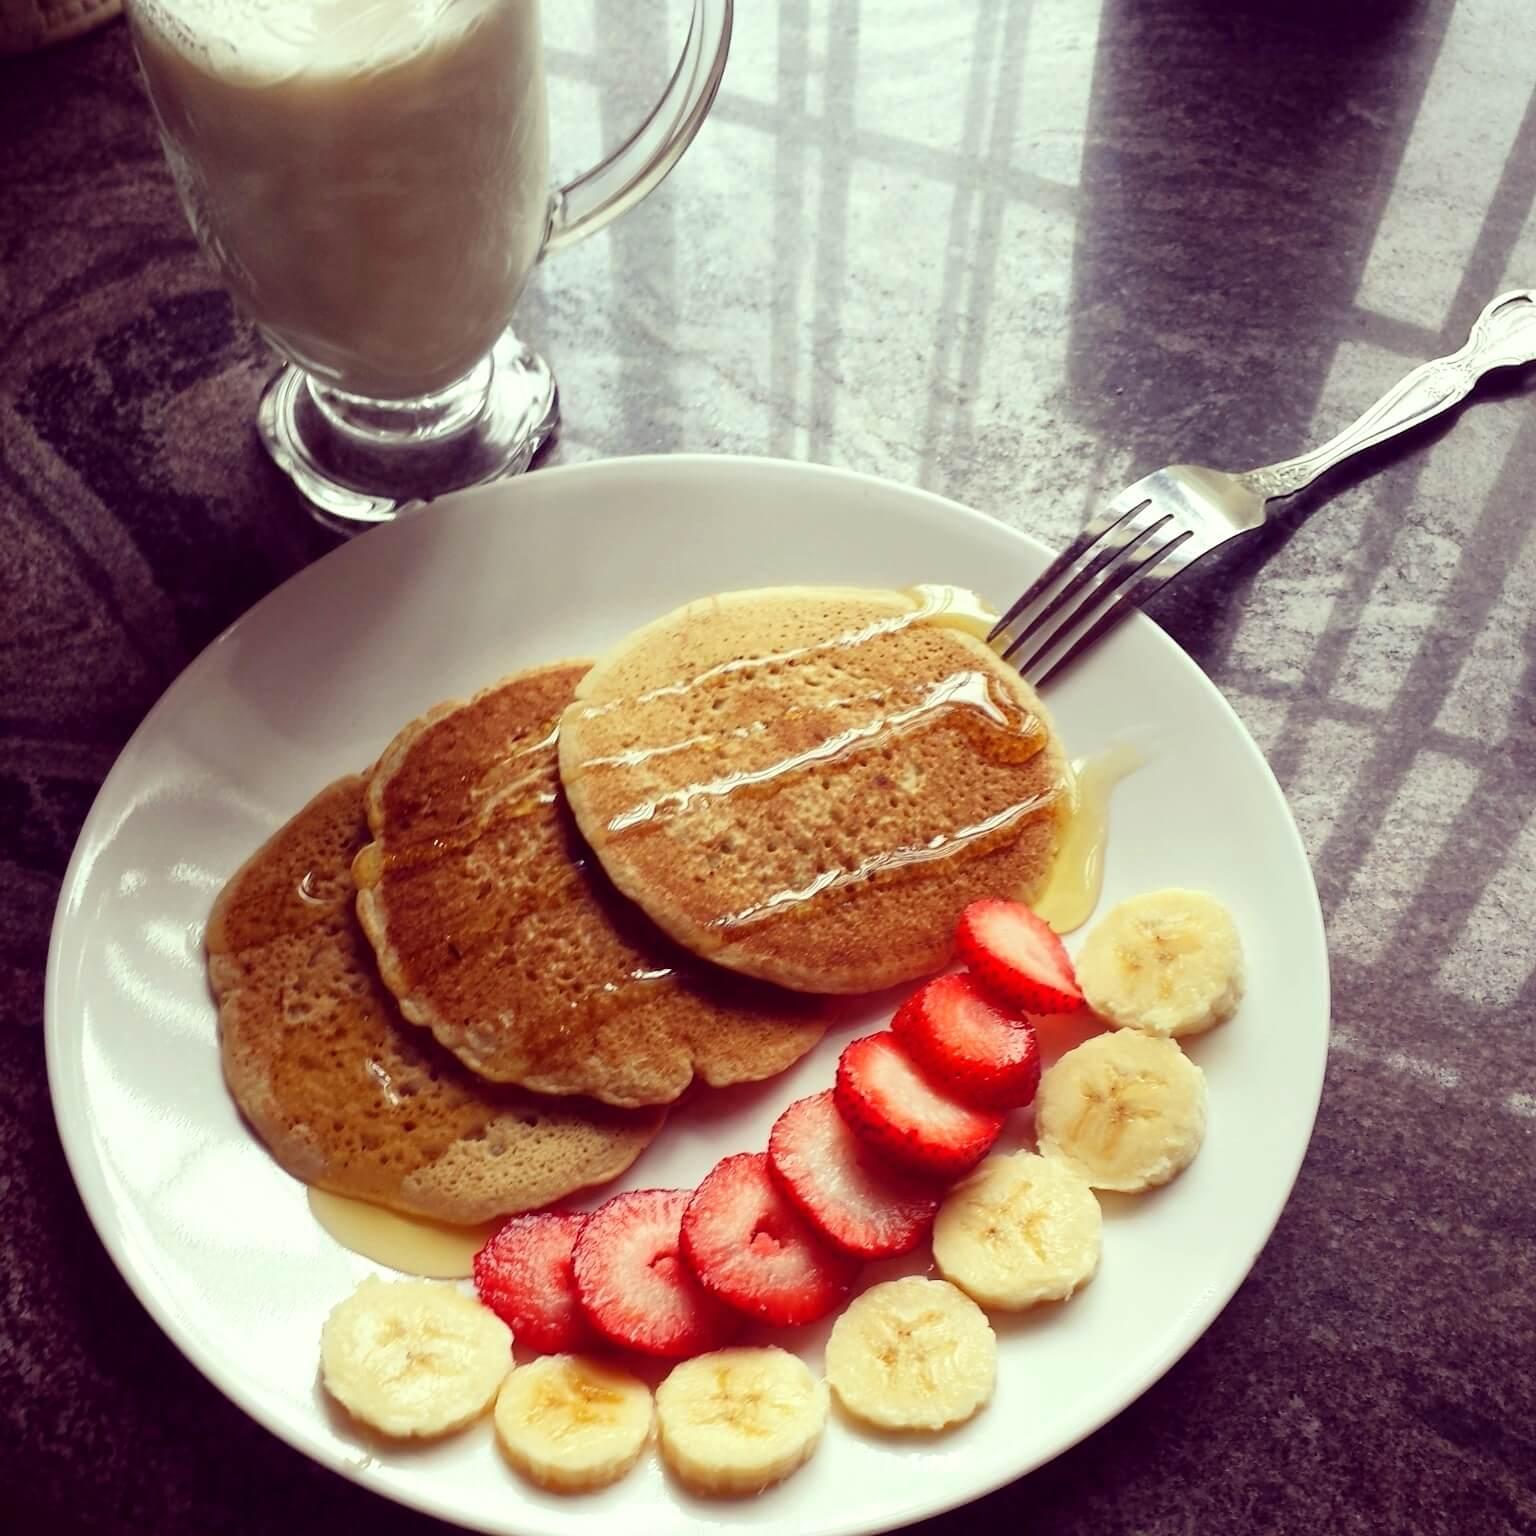 Desayunos nutritivos para ninos de dos anos